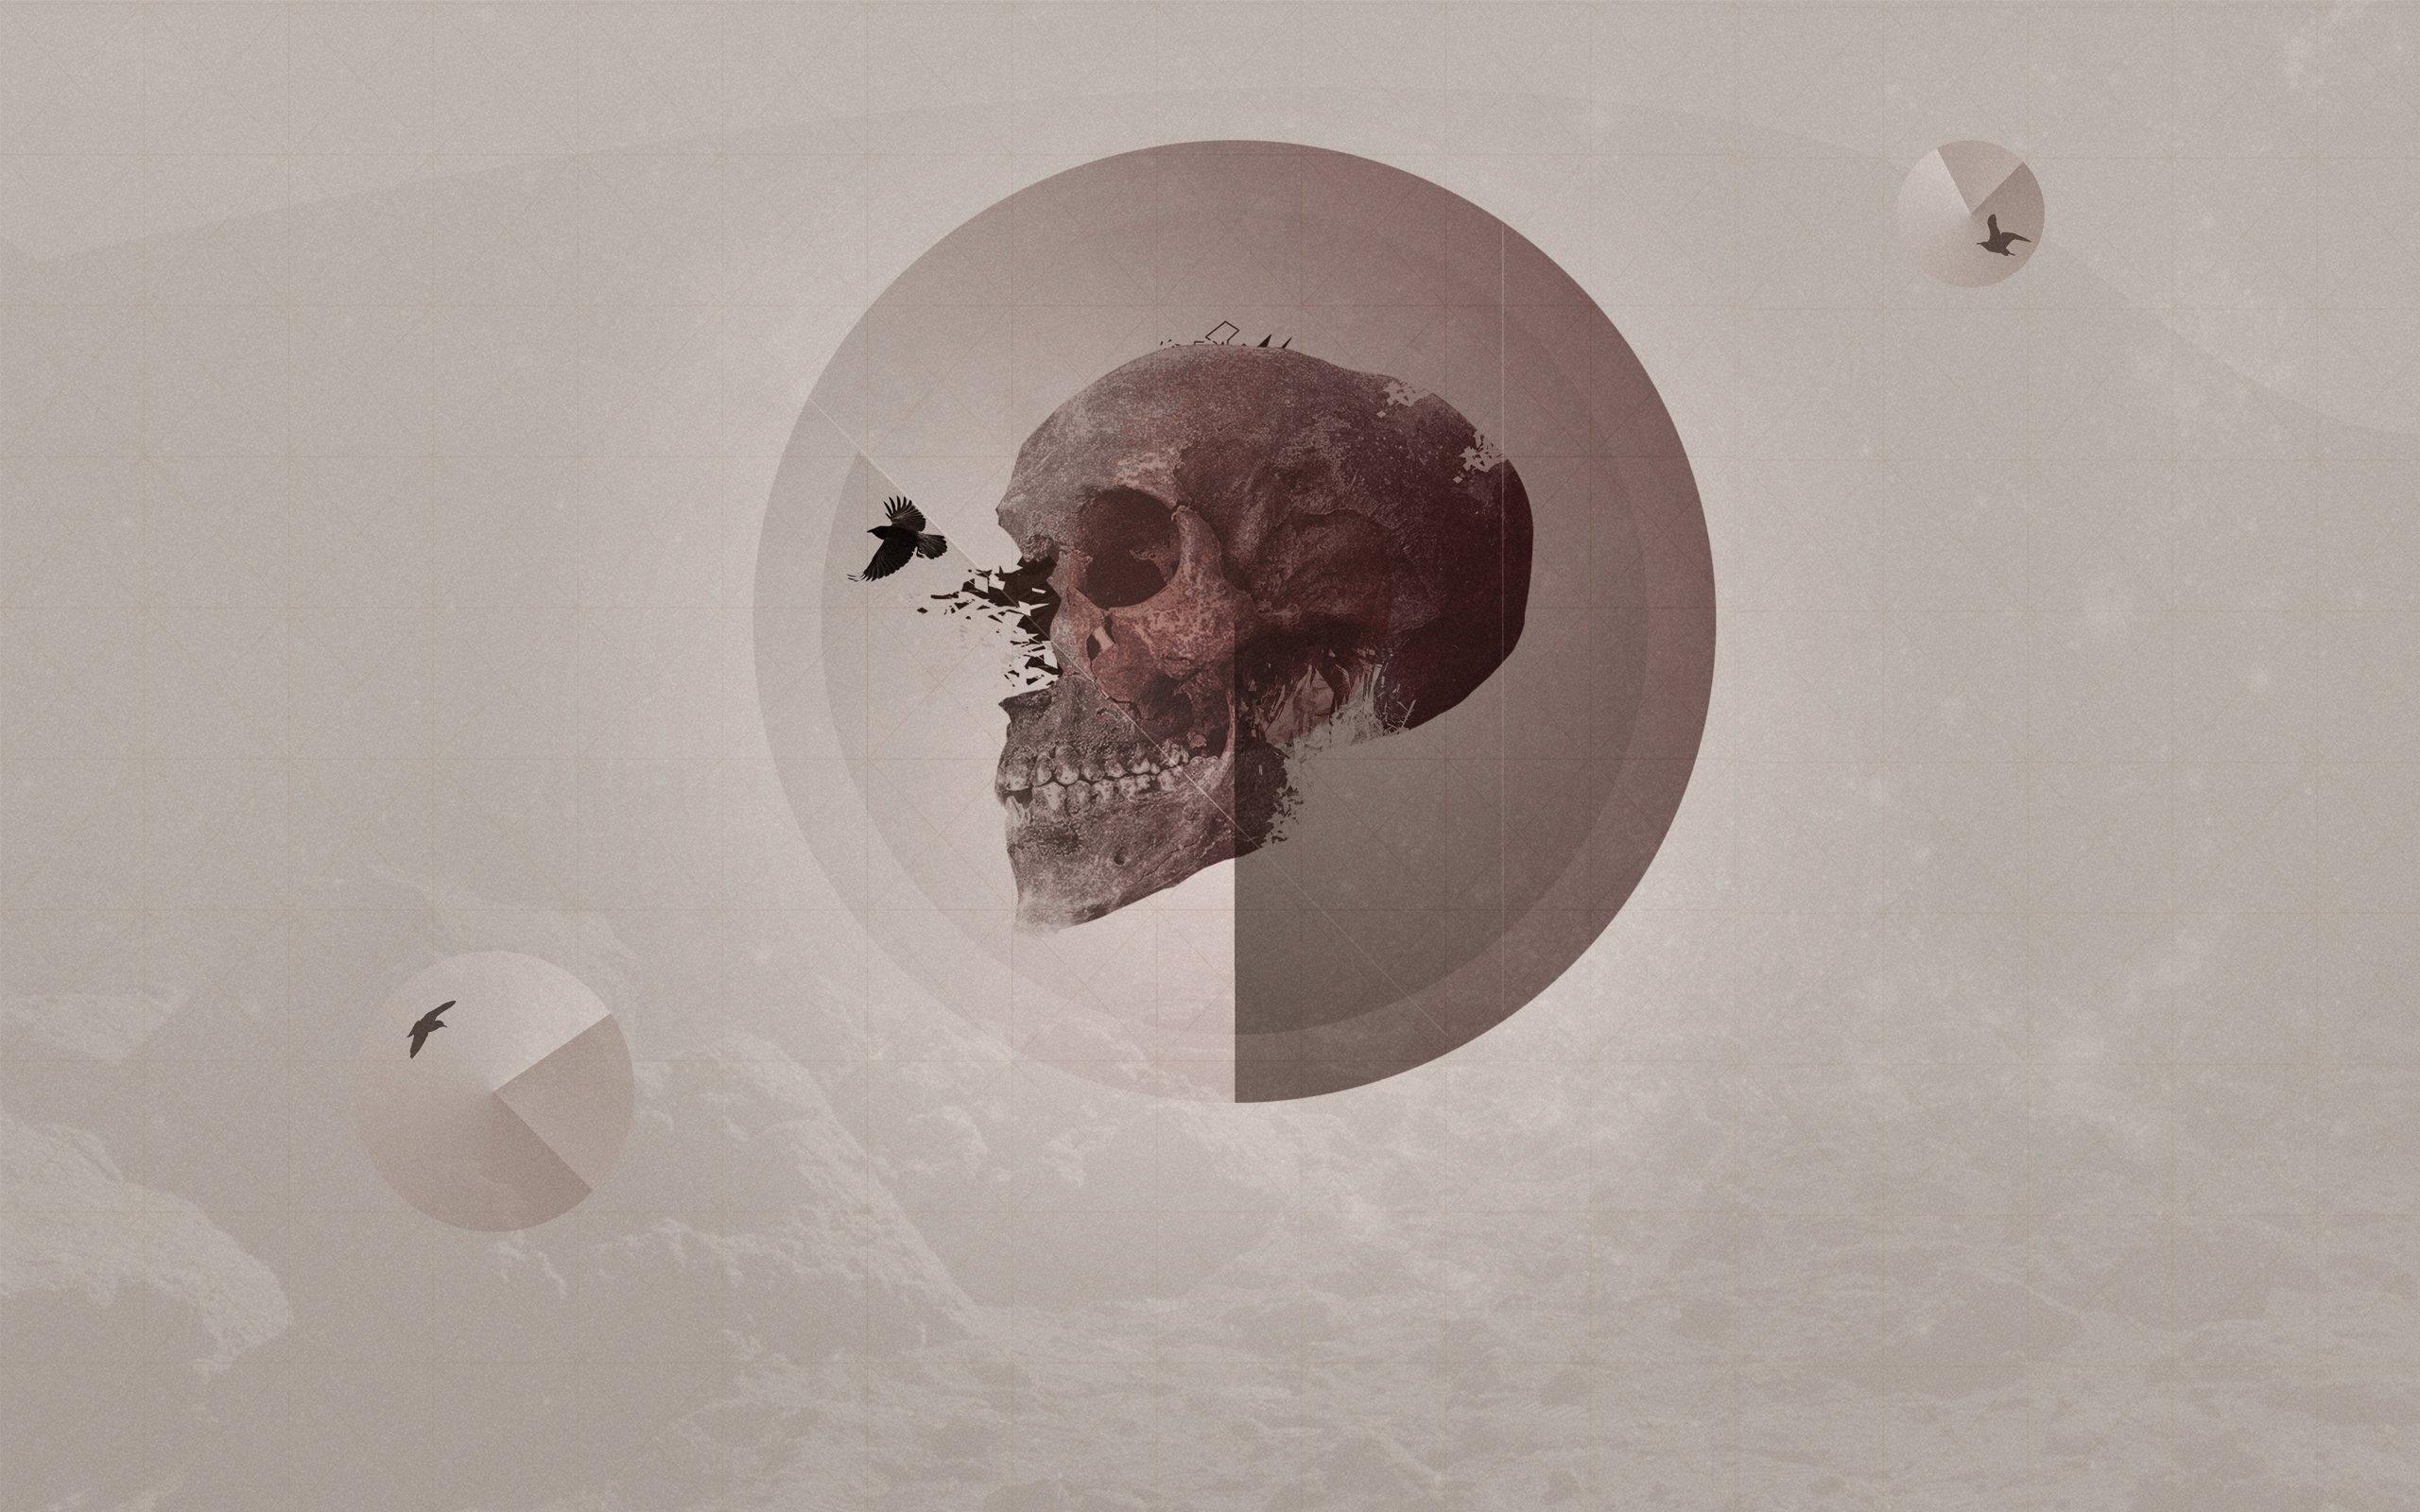 skull 4K wallpapers for your desktop or mobile screen free